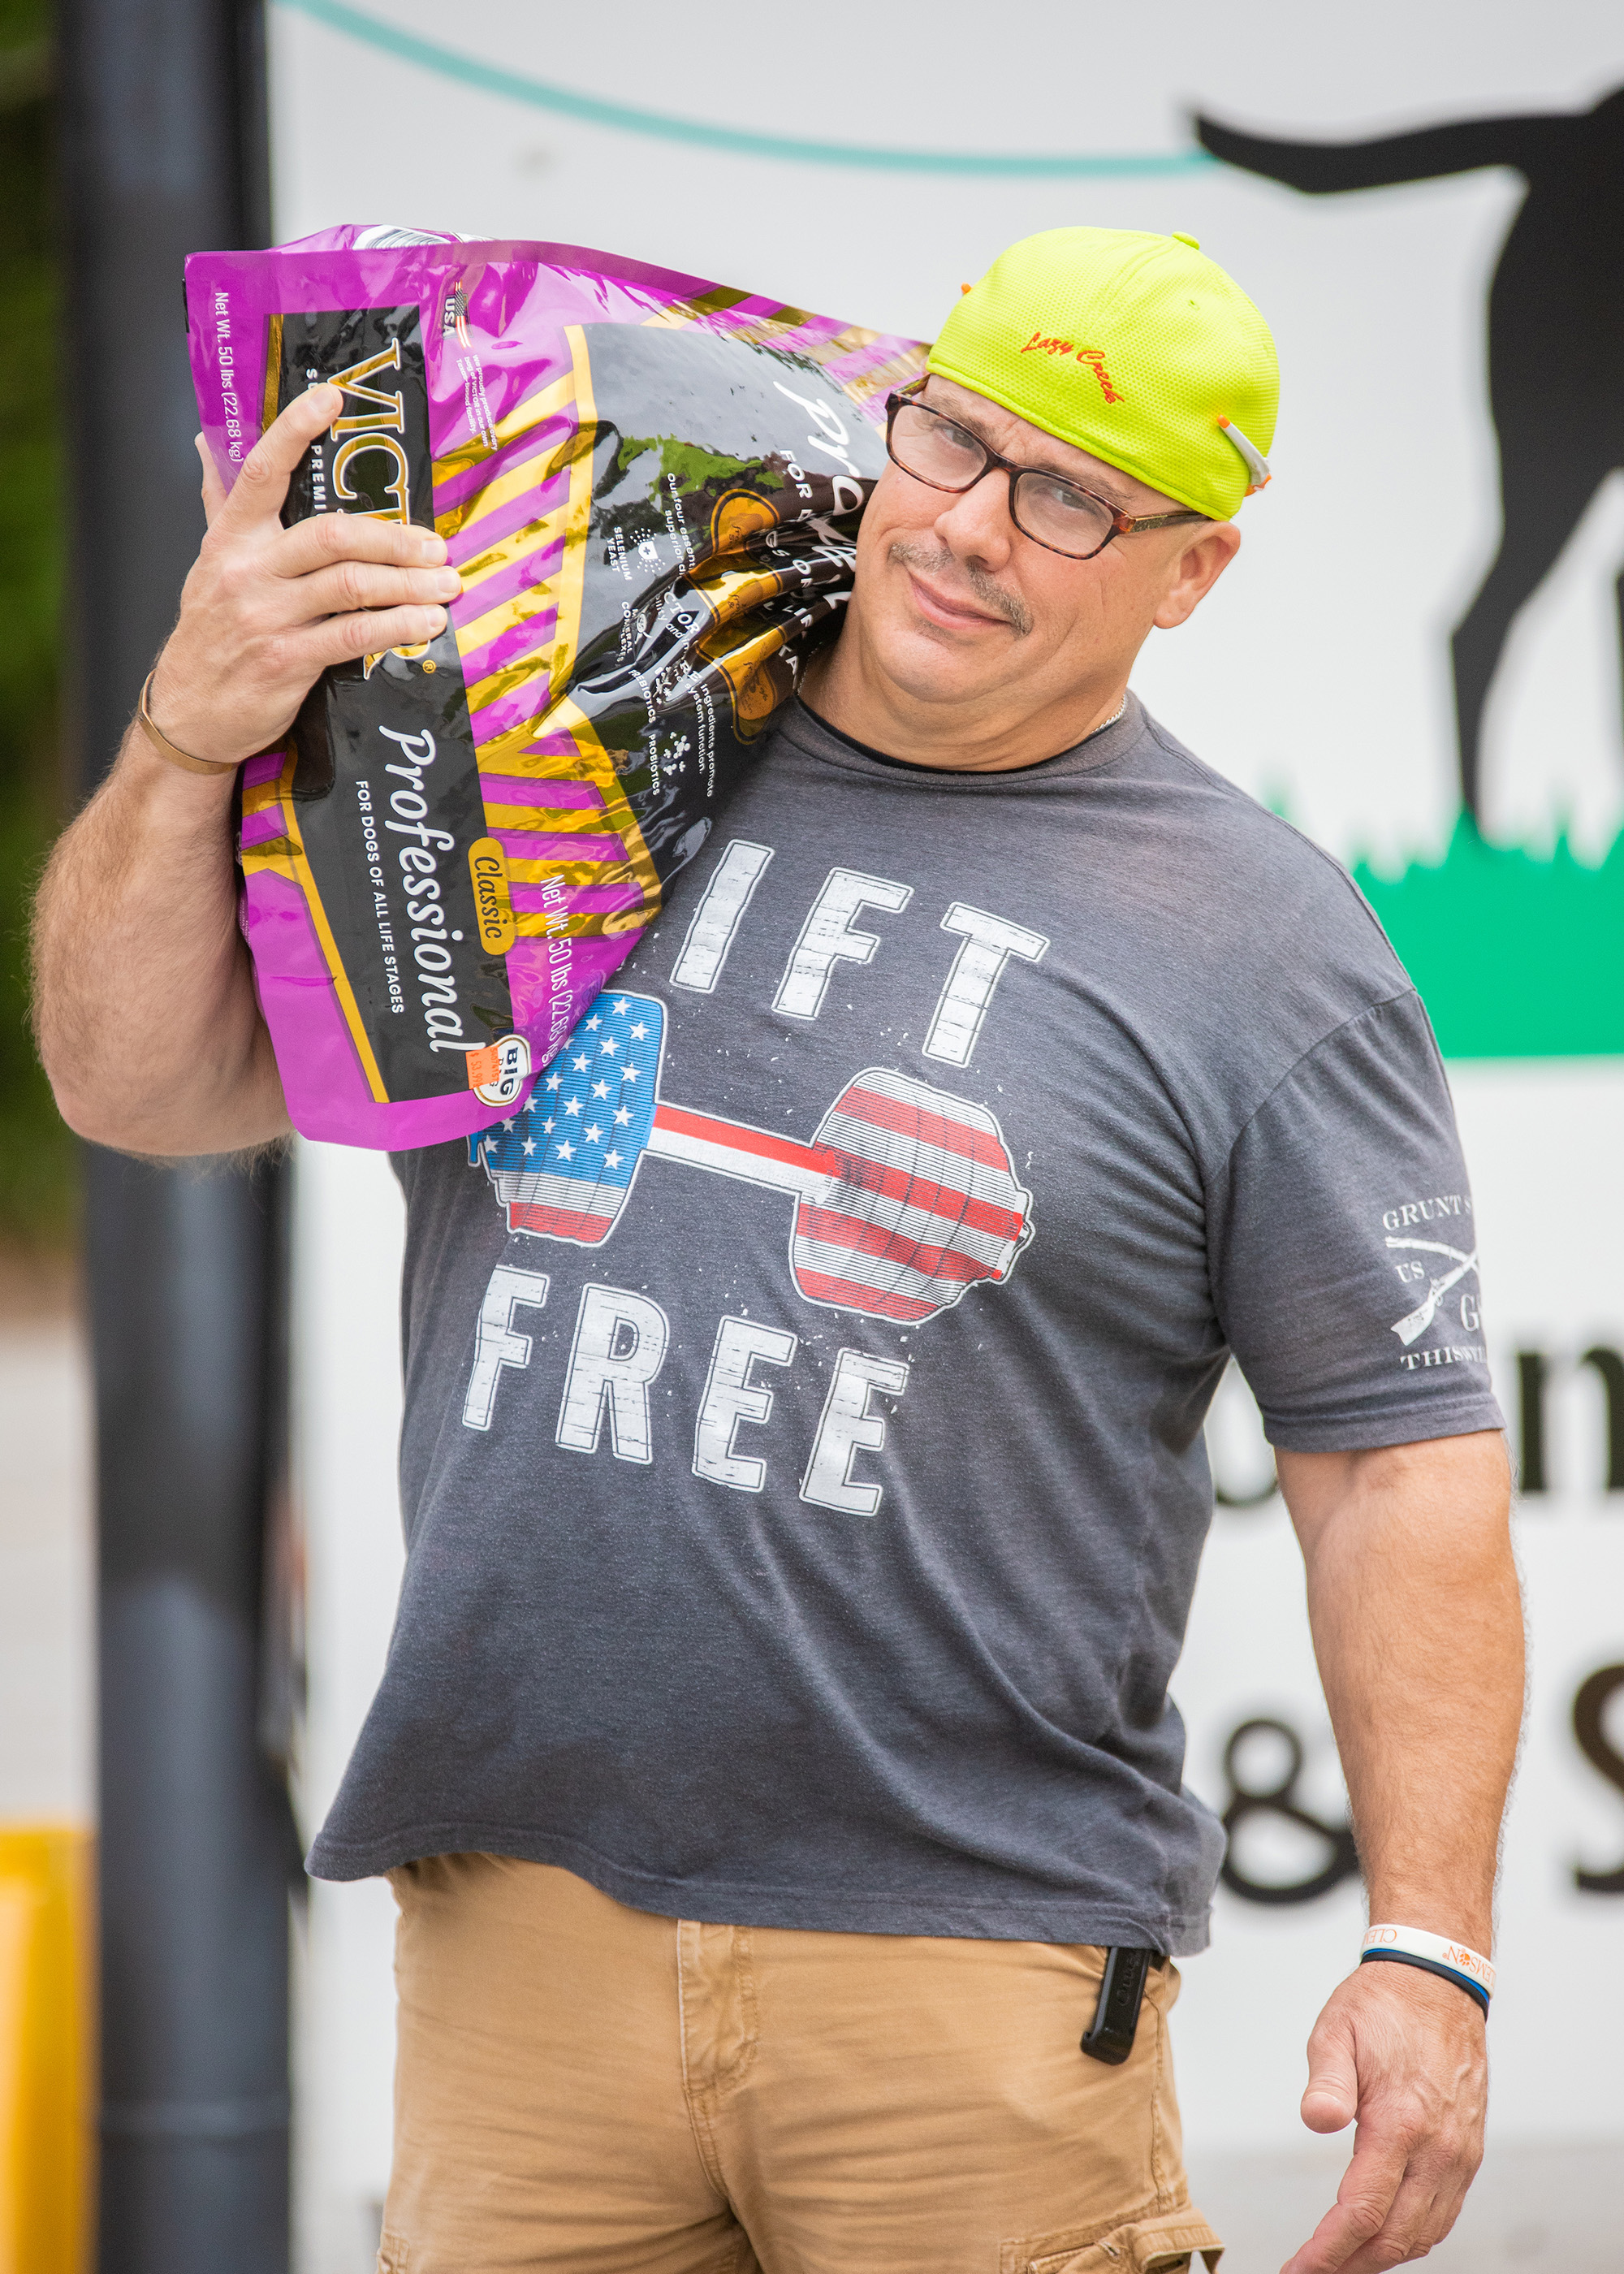 man carrying bag of dog food to customer car